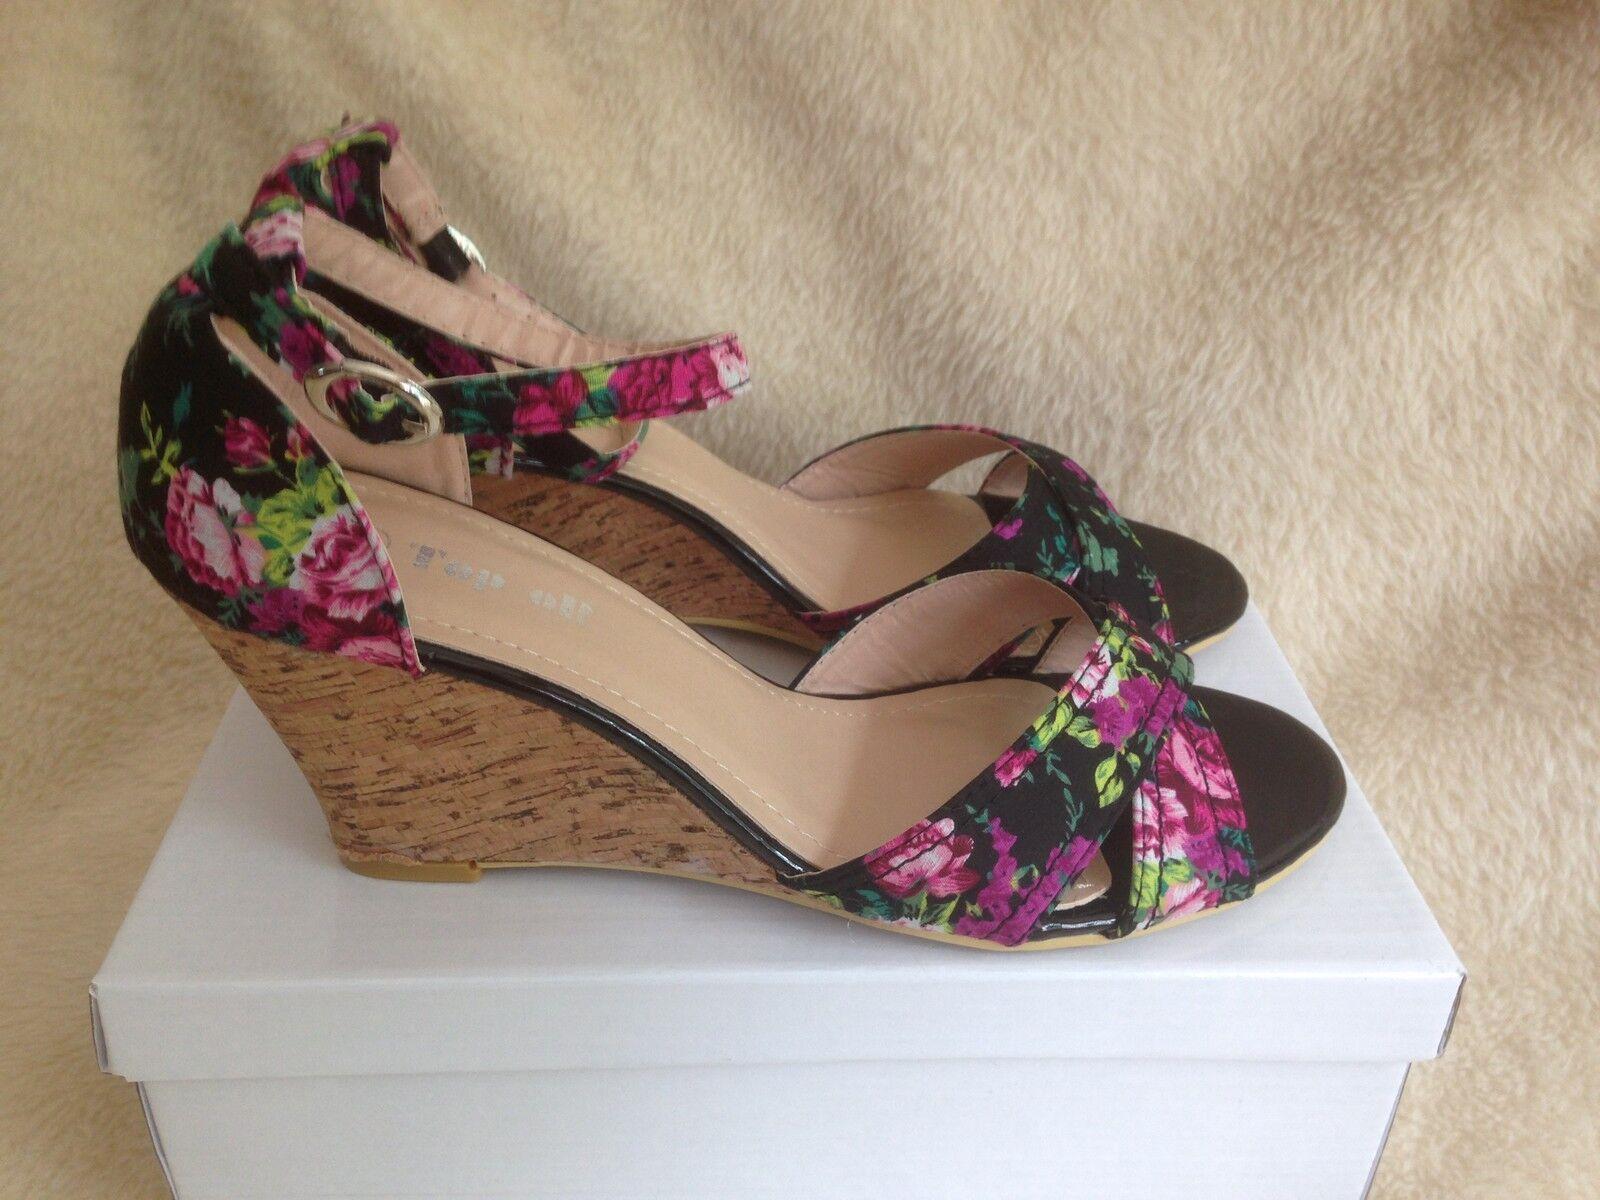 Damen Keilsandaletten Strass Blumen Keilabsatz Riemchensandaletten 817565 Schuhe